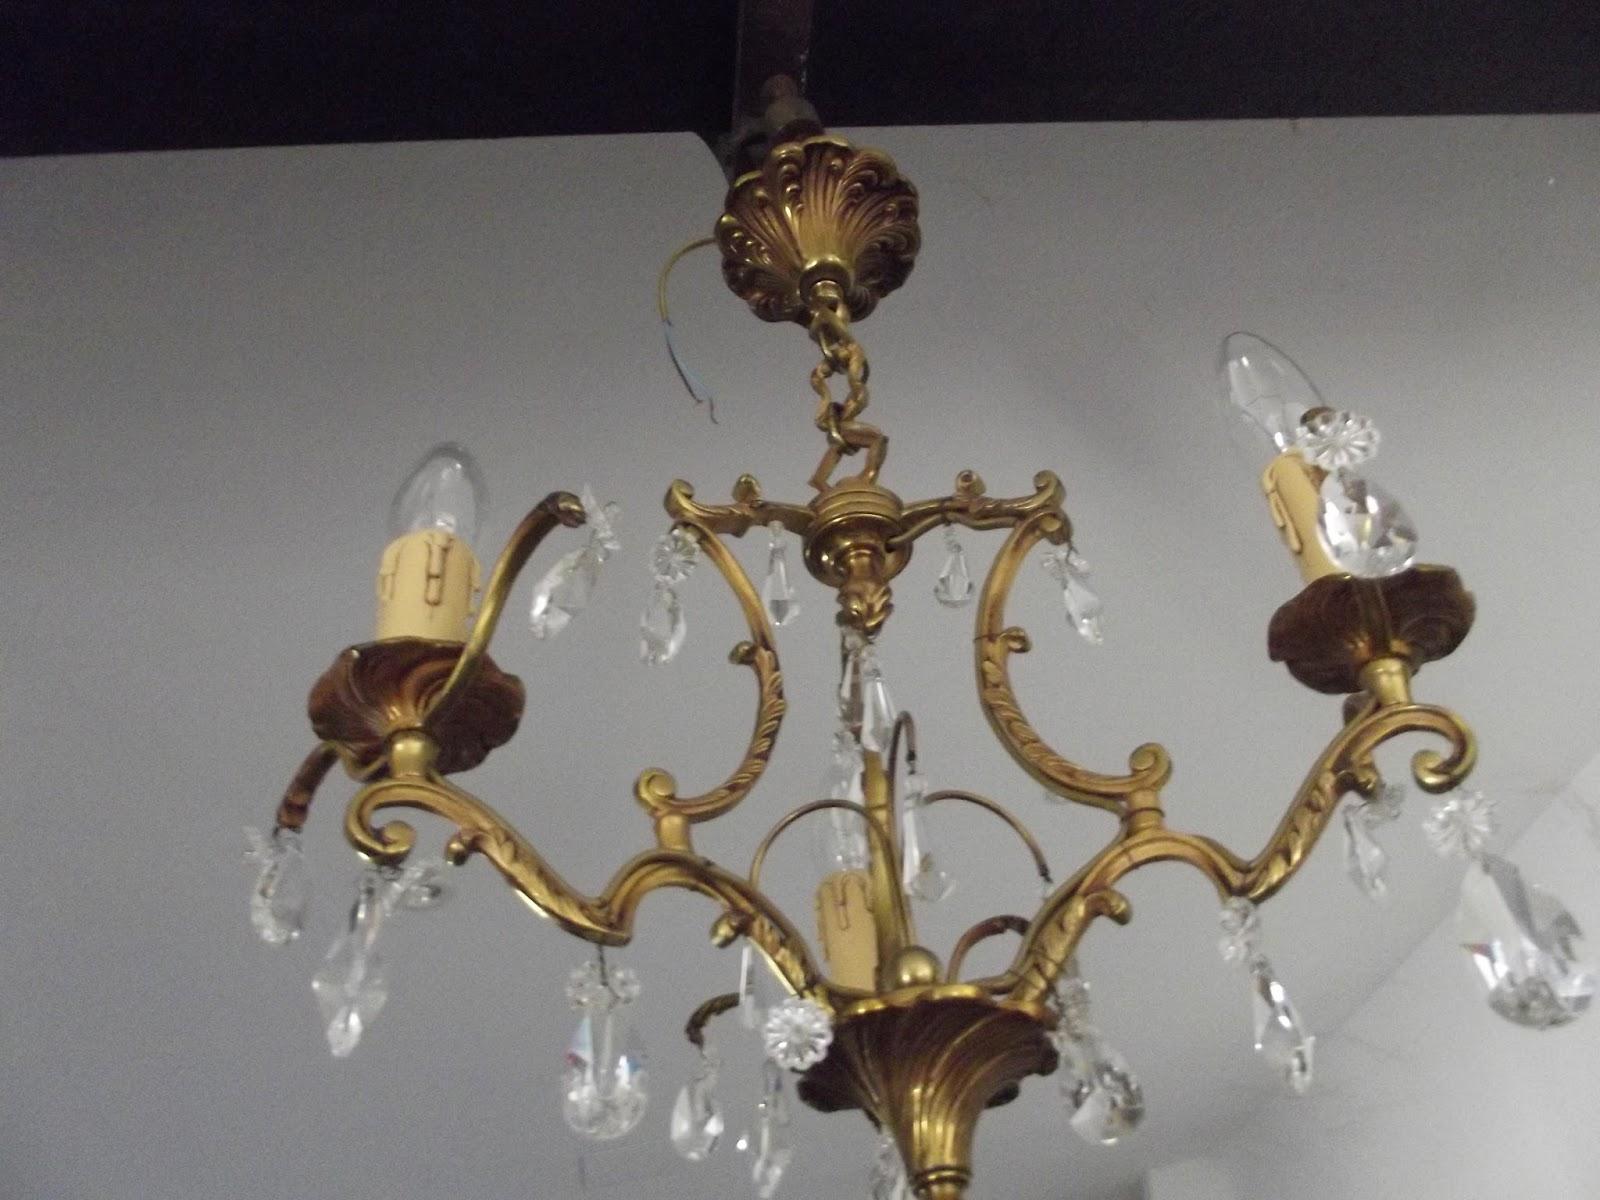 ancien petit lustre cage bronze a pampilles pendeloques suspension cristal verre ebay. Black Bedroom Furniture Sets. Home Design Ideas